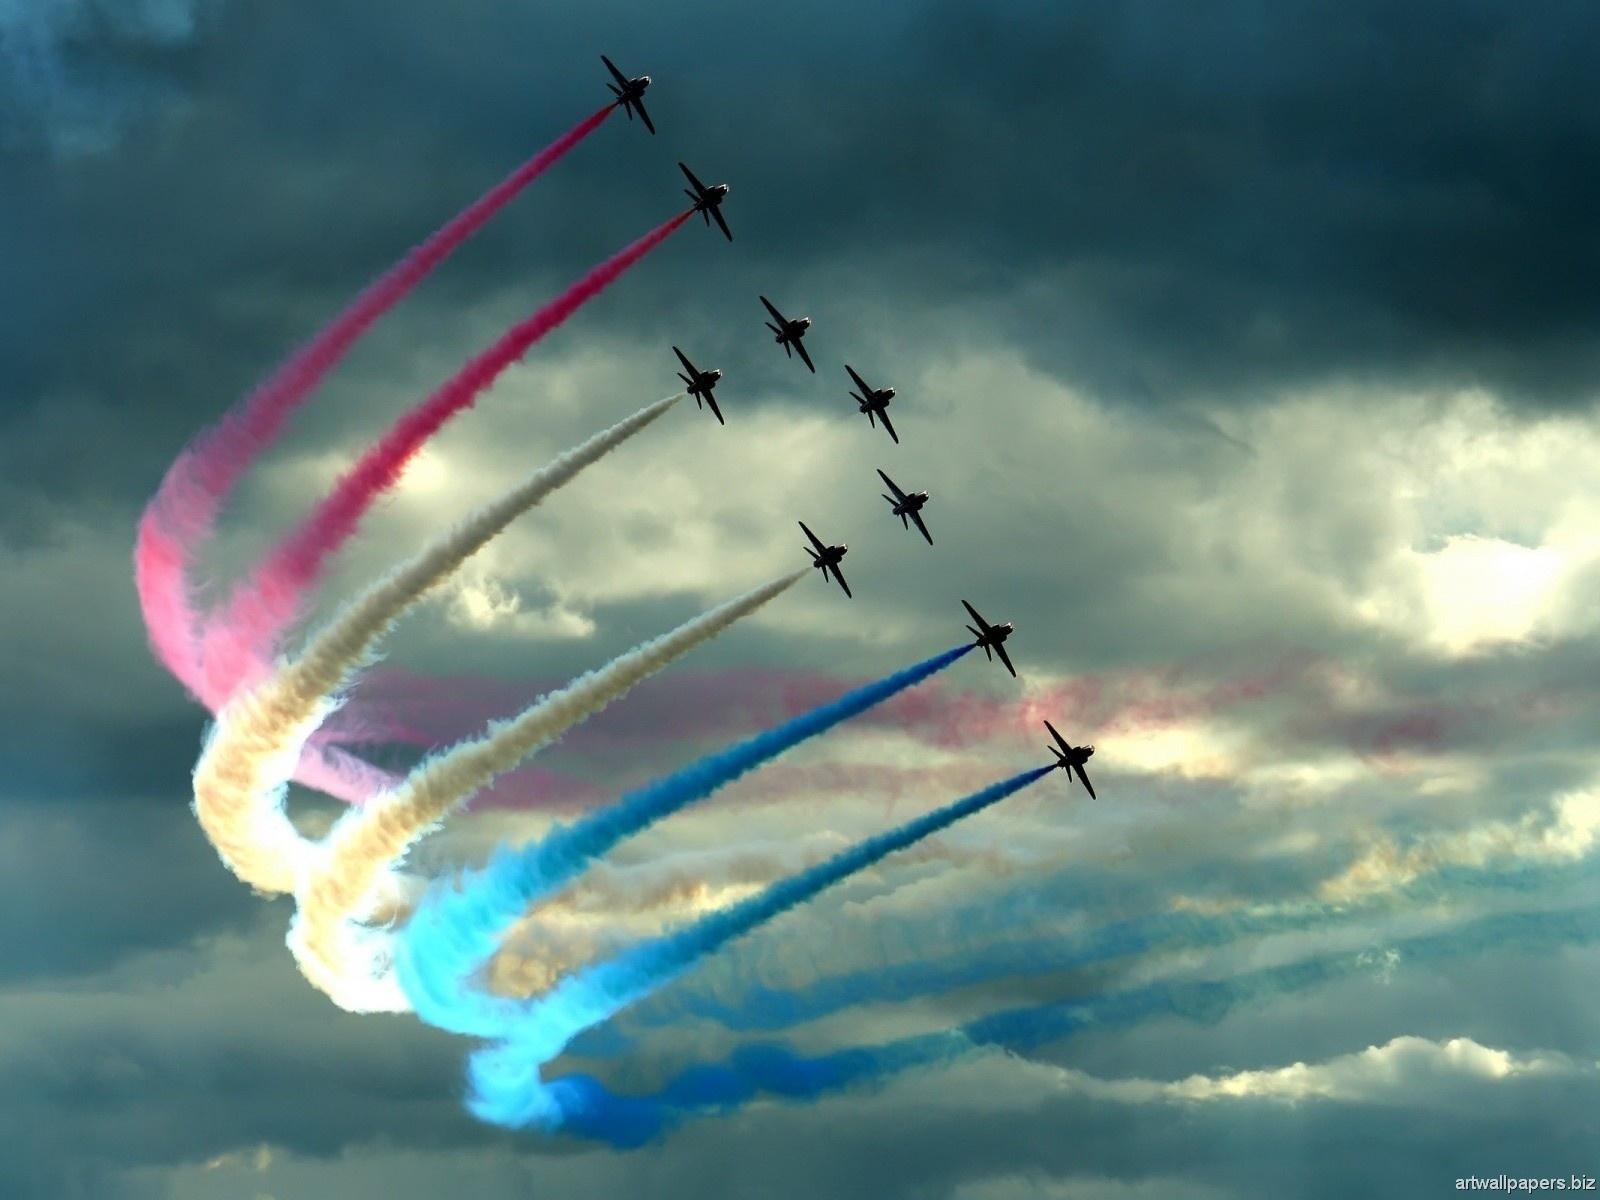 Airplane_aeroplane_aircraft_jet_wallpapers (6)